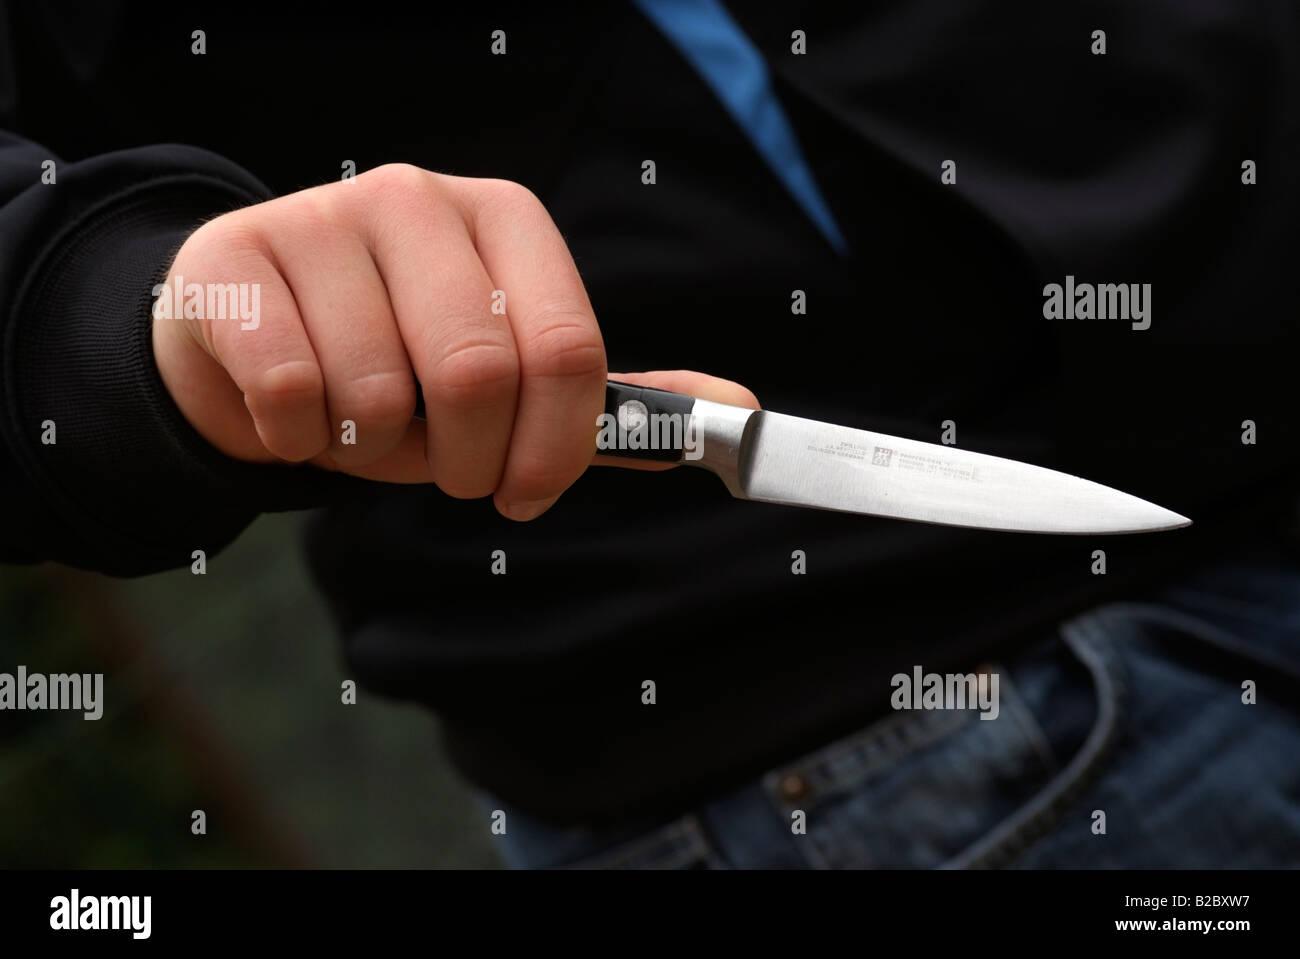 Knife crime. Boy's hand holding a kitchen knife - Stock Image